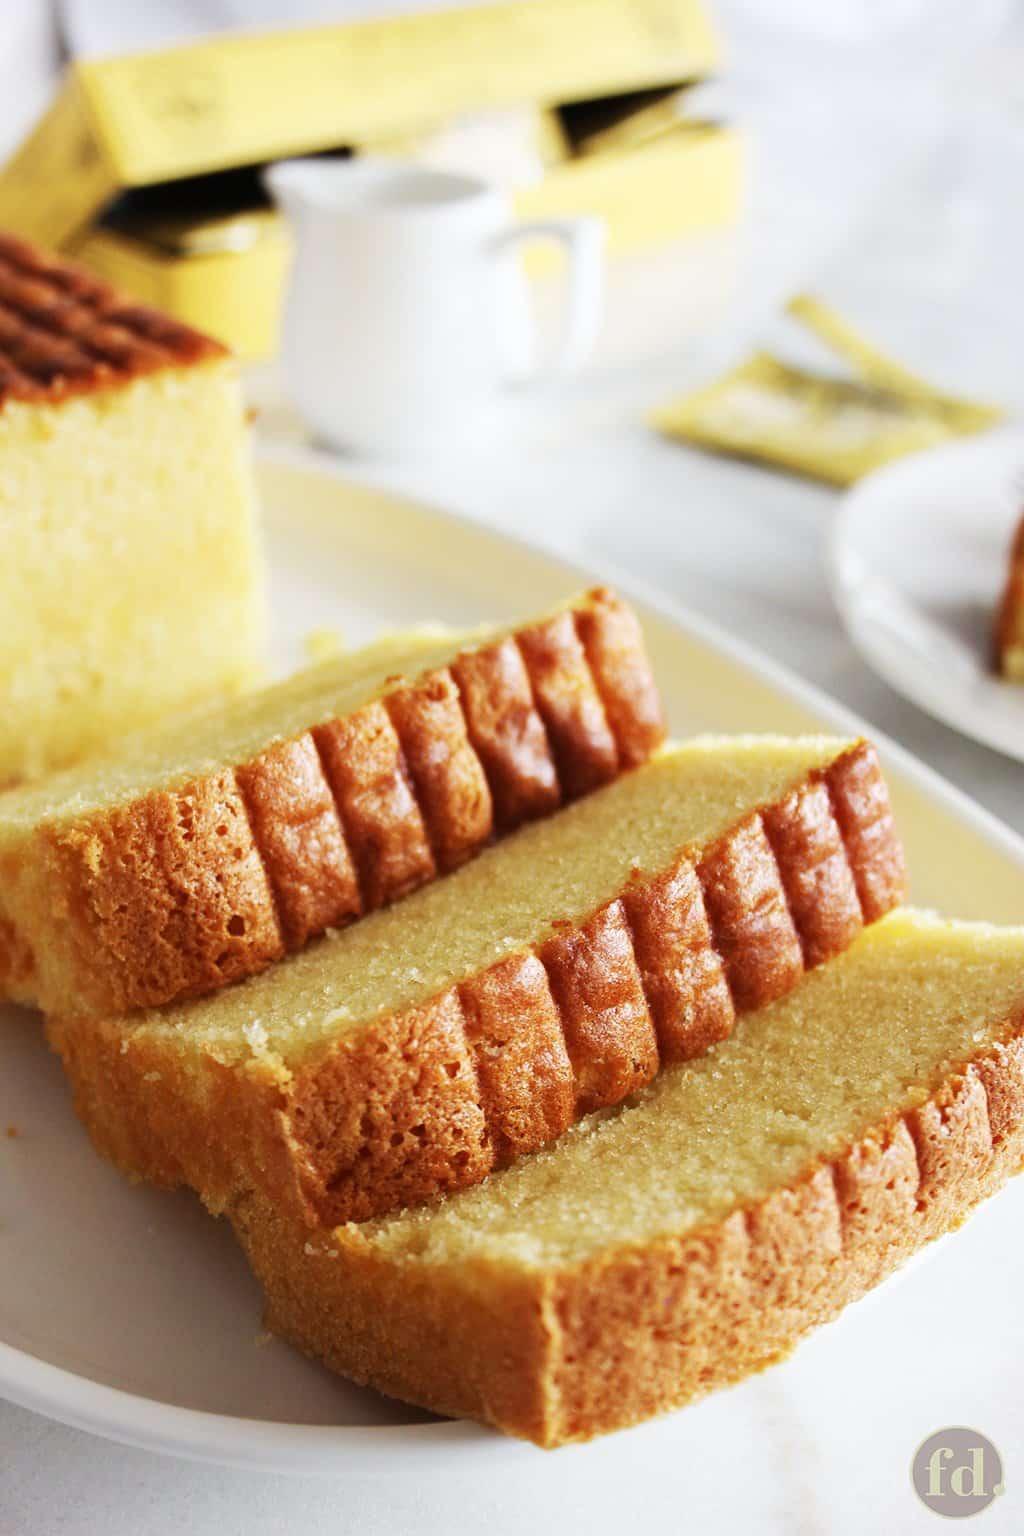 Very rich butter cake